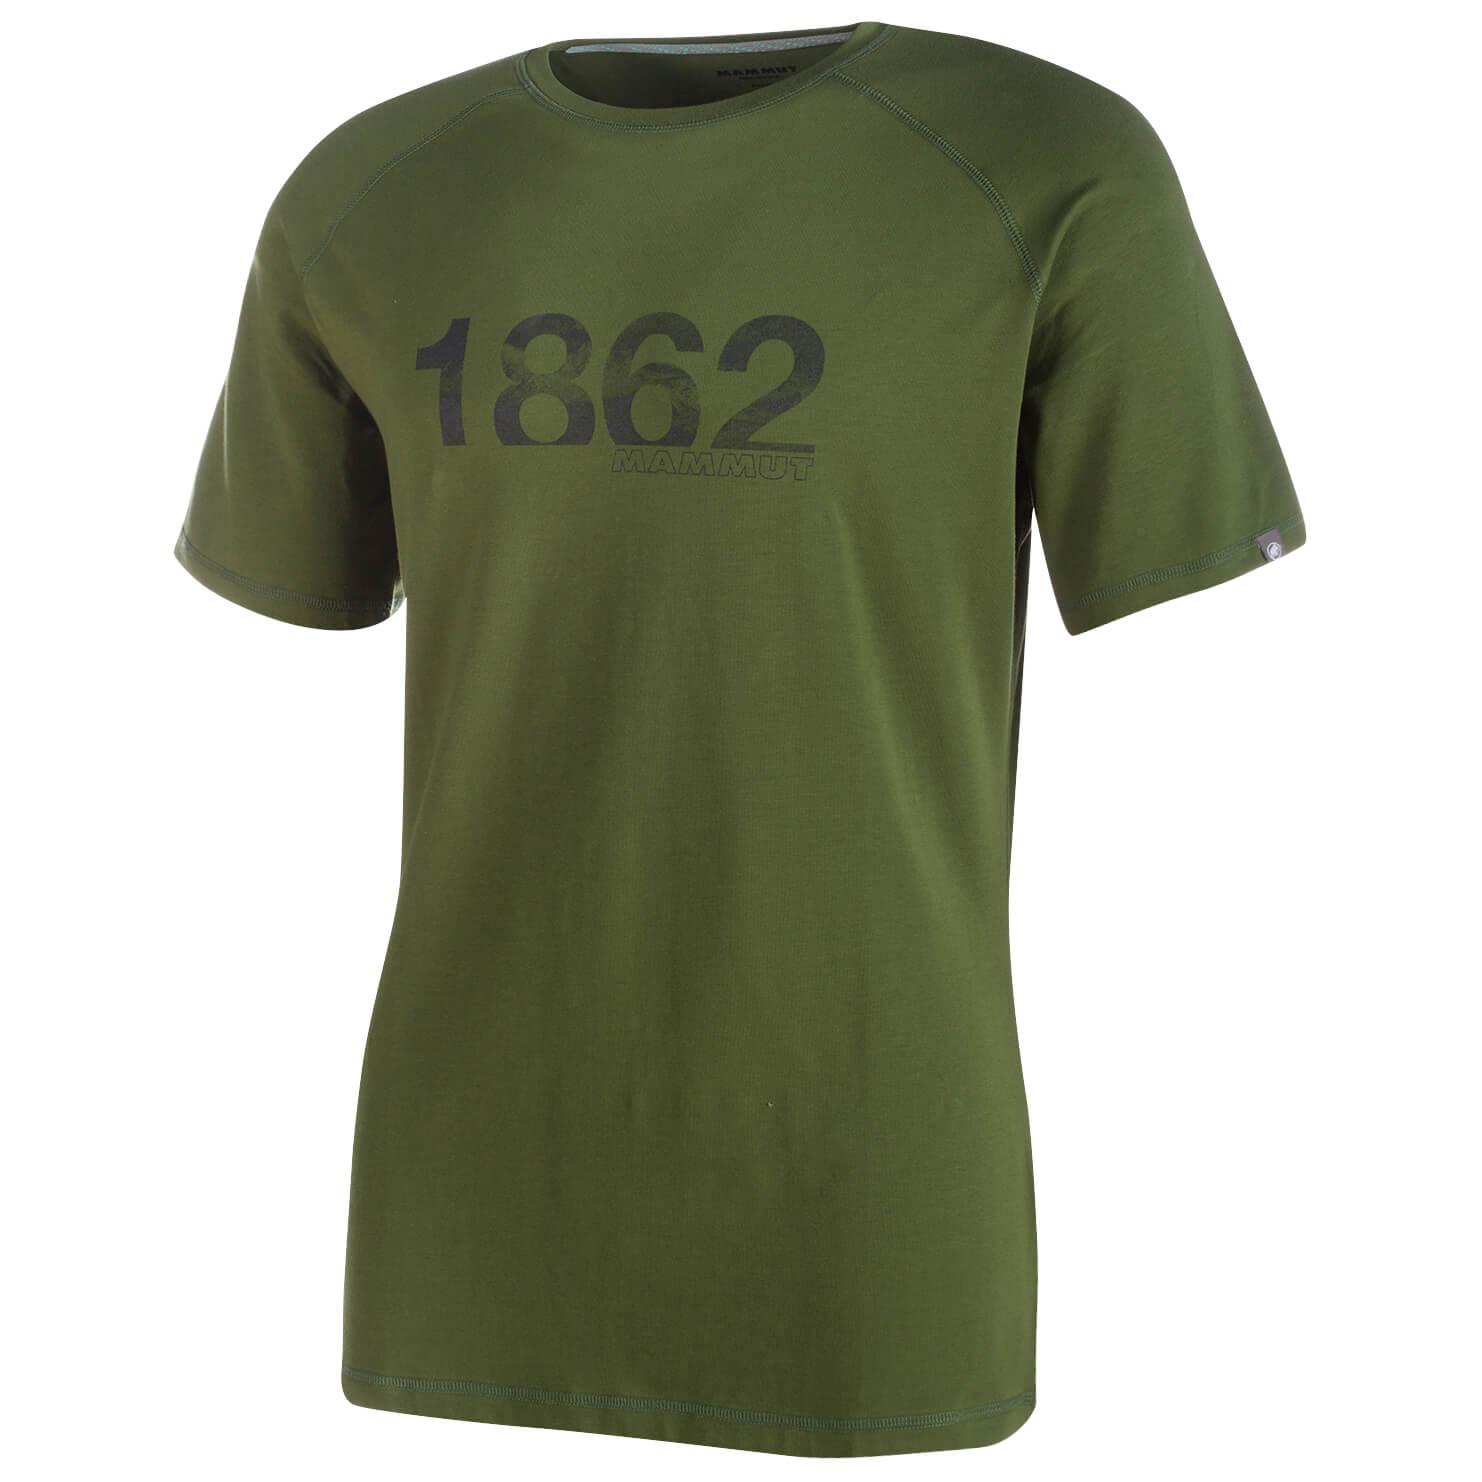 Mammut vintage t shirt t shirt men 39 s buy online for Vintage t shirt company